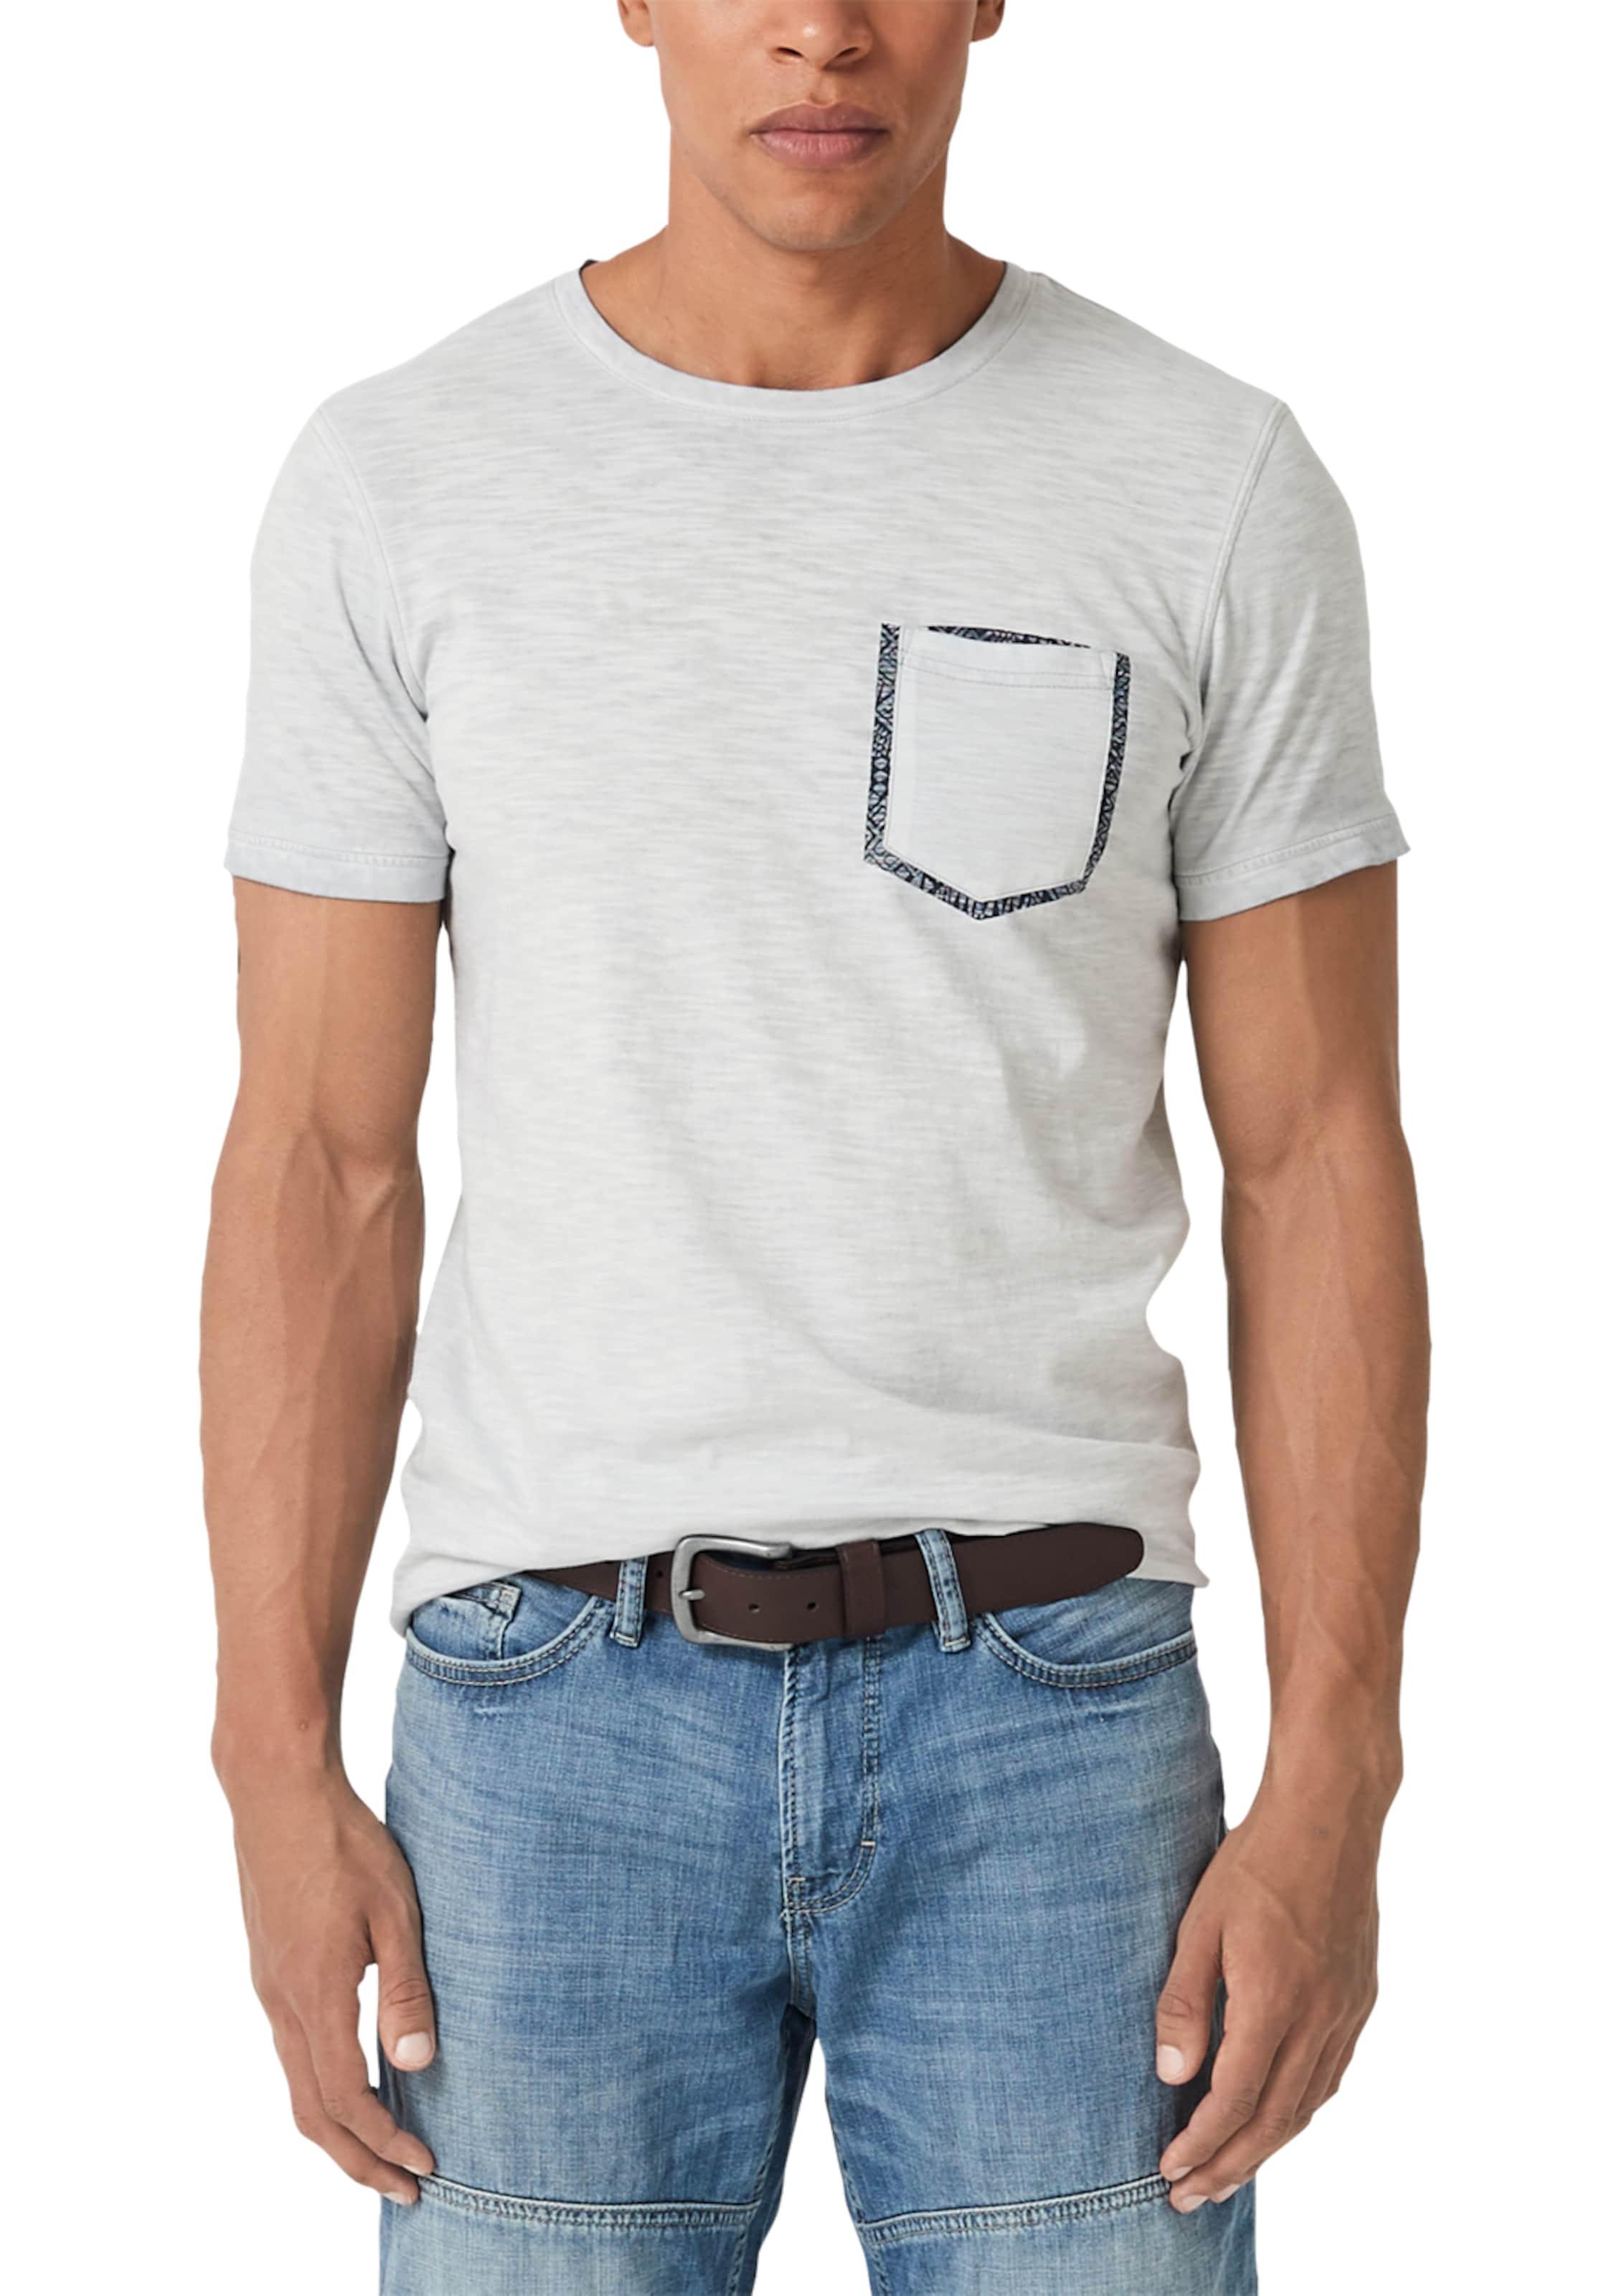 S Shirt In Red Label oliver BlauHellgrau sdthrQC